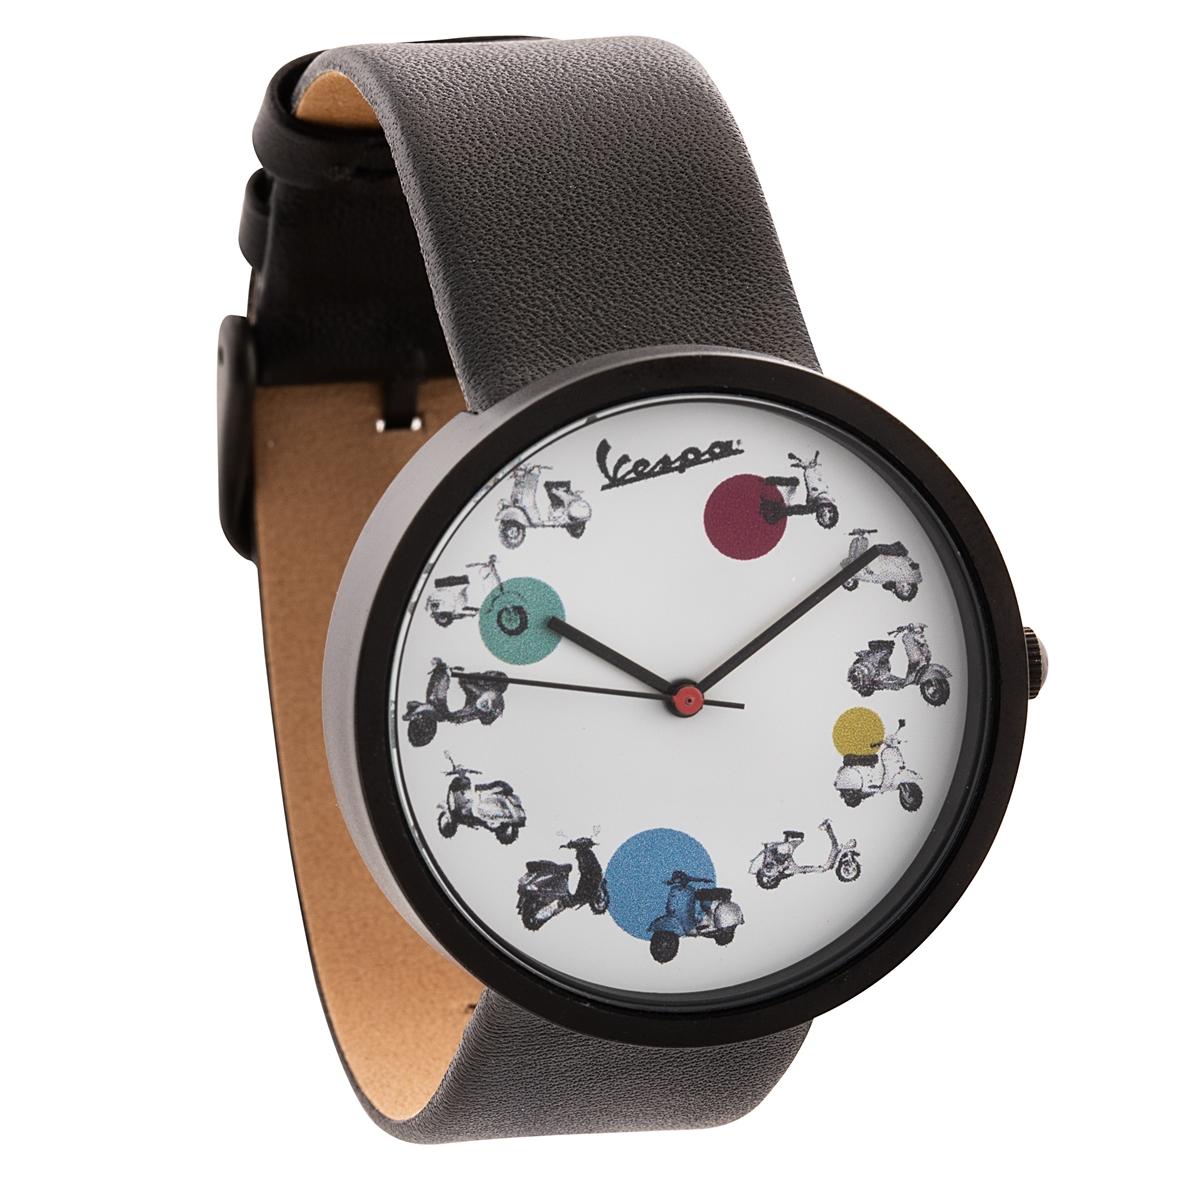 "Product Image for 'Watch PIAGGIO ""Vespa""Title'"